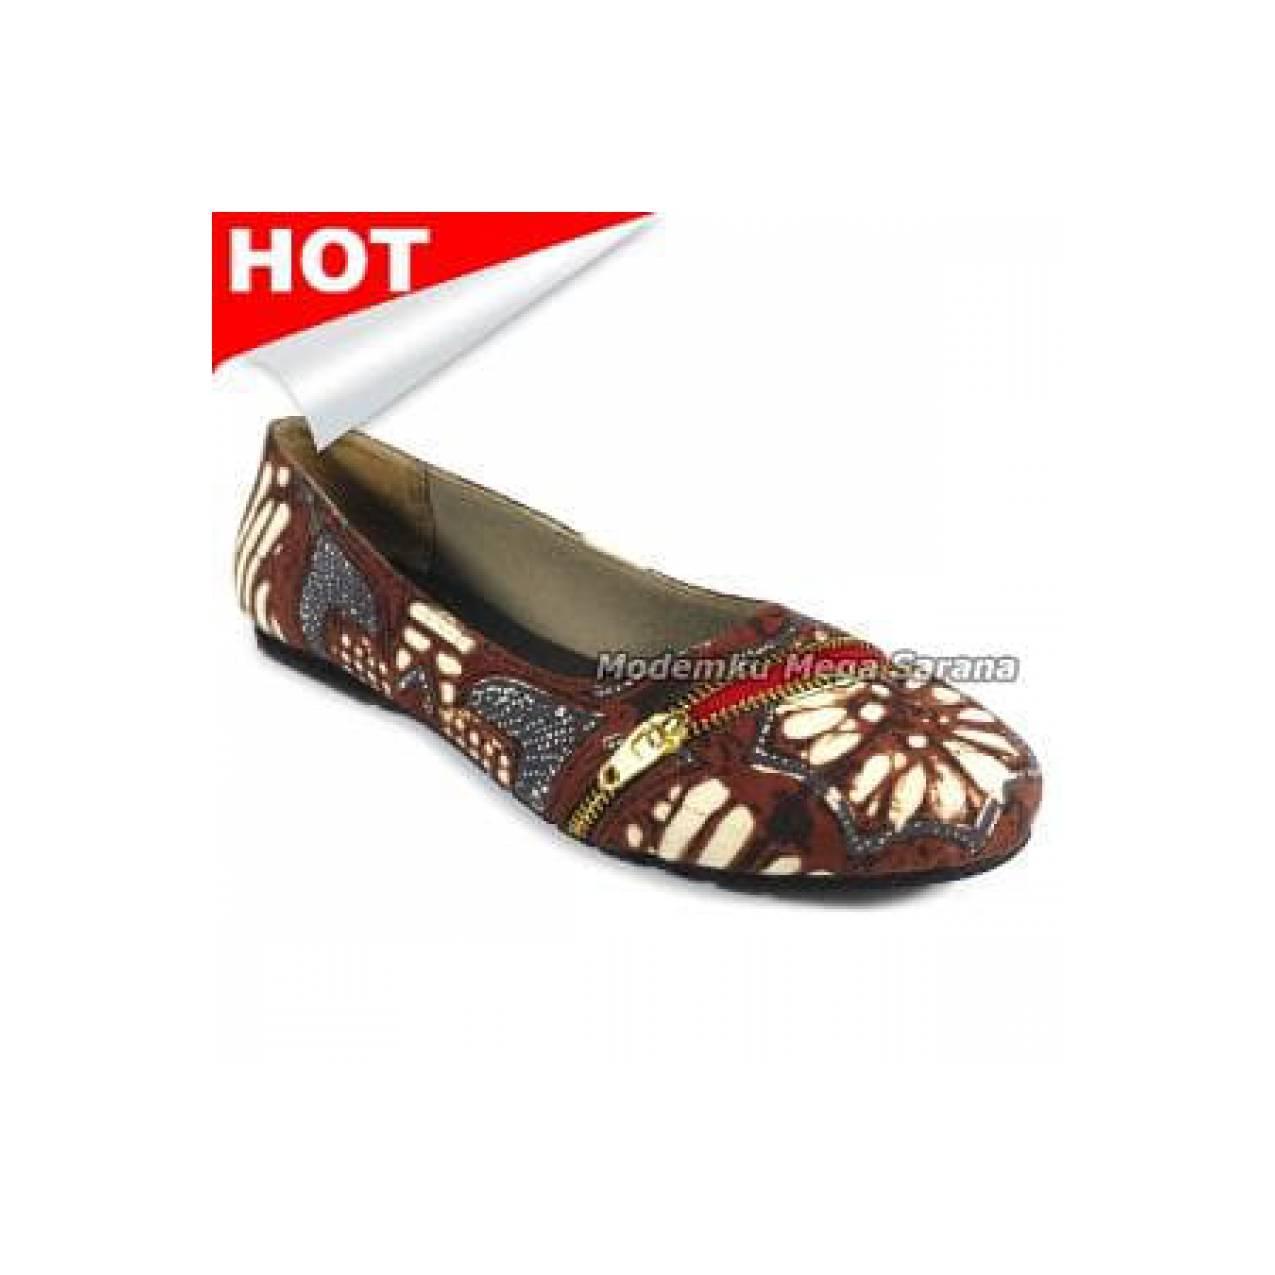 Sikaki Sepatu Batik Jogja Murah Motif SKK03 FREE ONGKIR